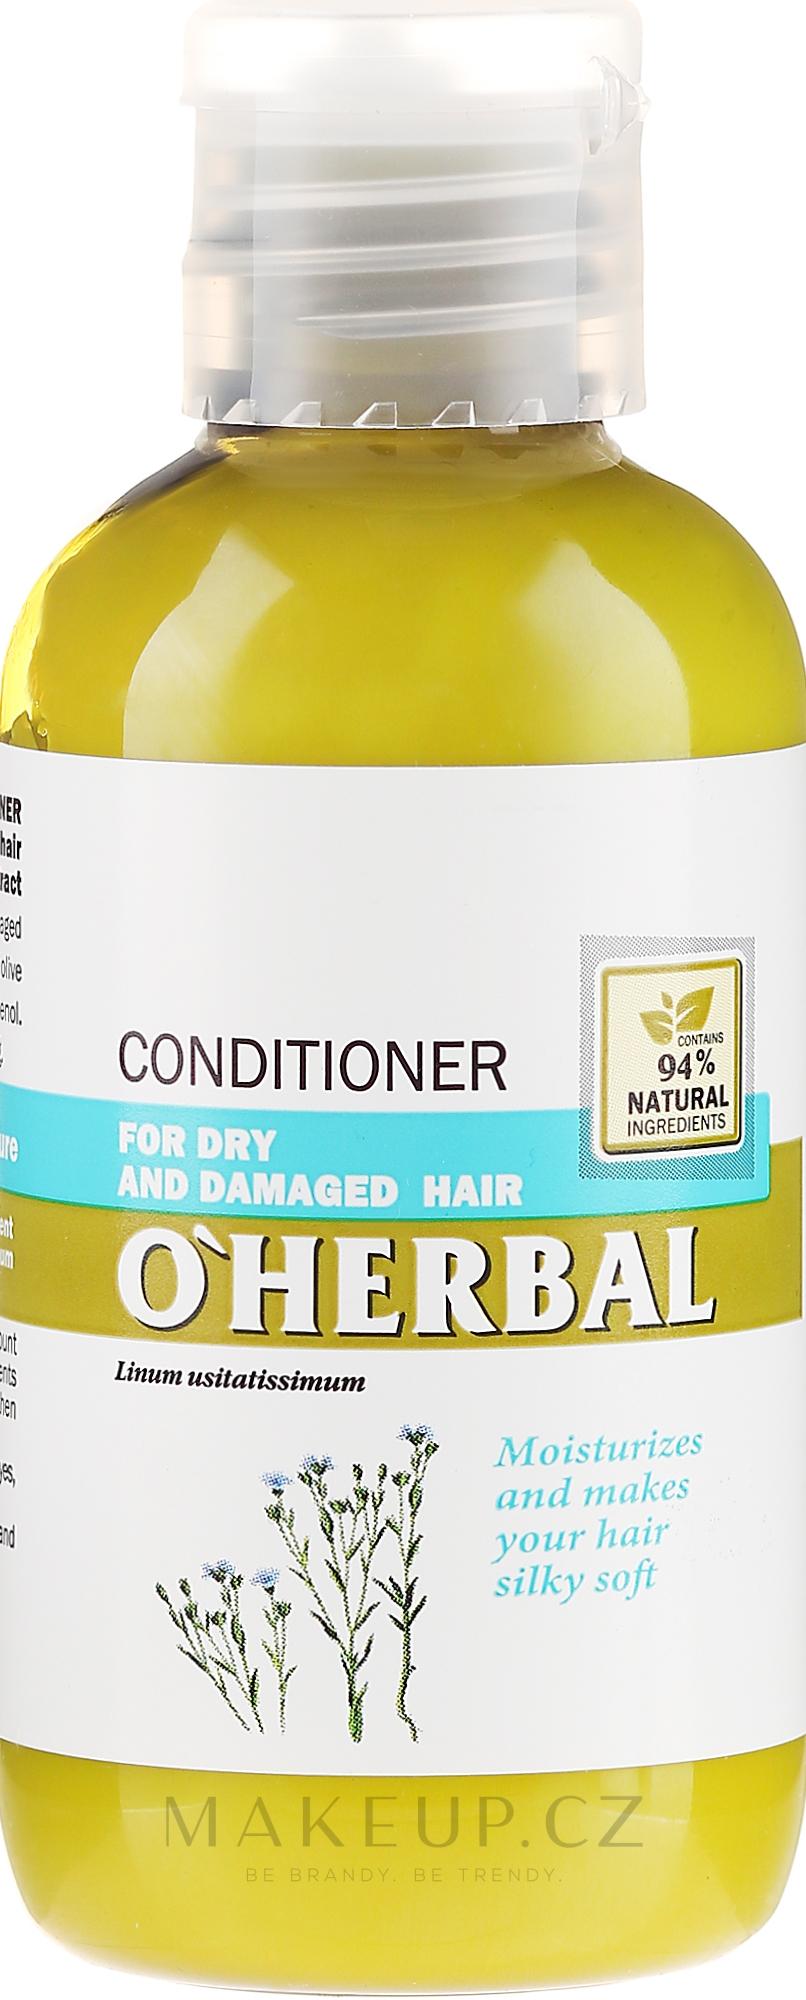 Balzám-kondicionér pro suché a matné vlasy s lněným extraktem - O'Herbal — foto 75 ml